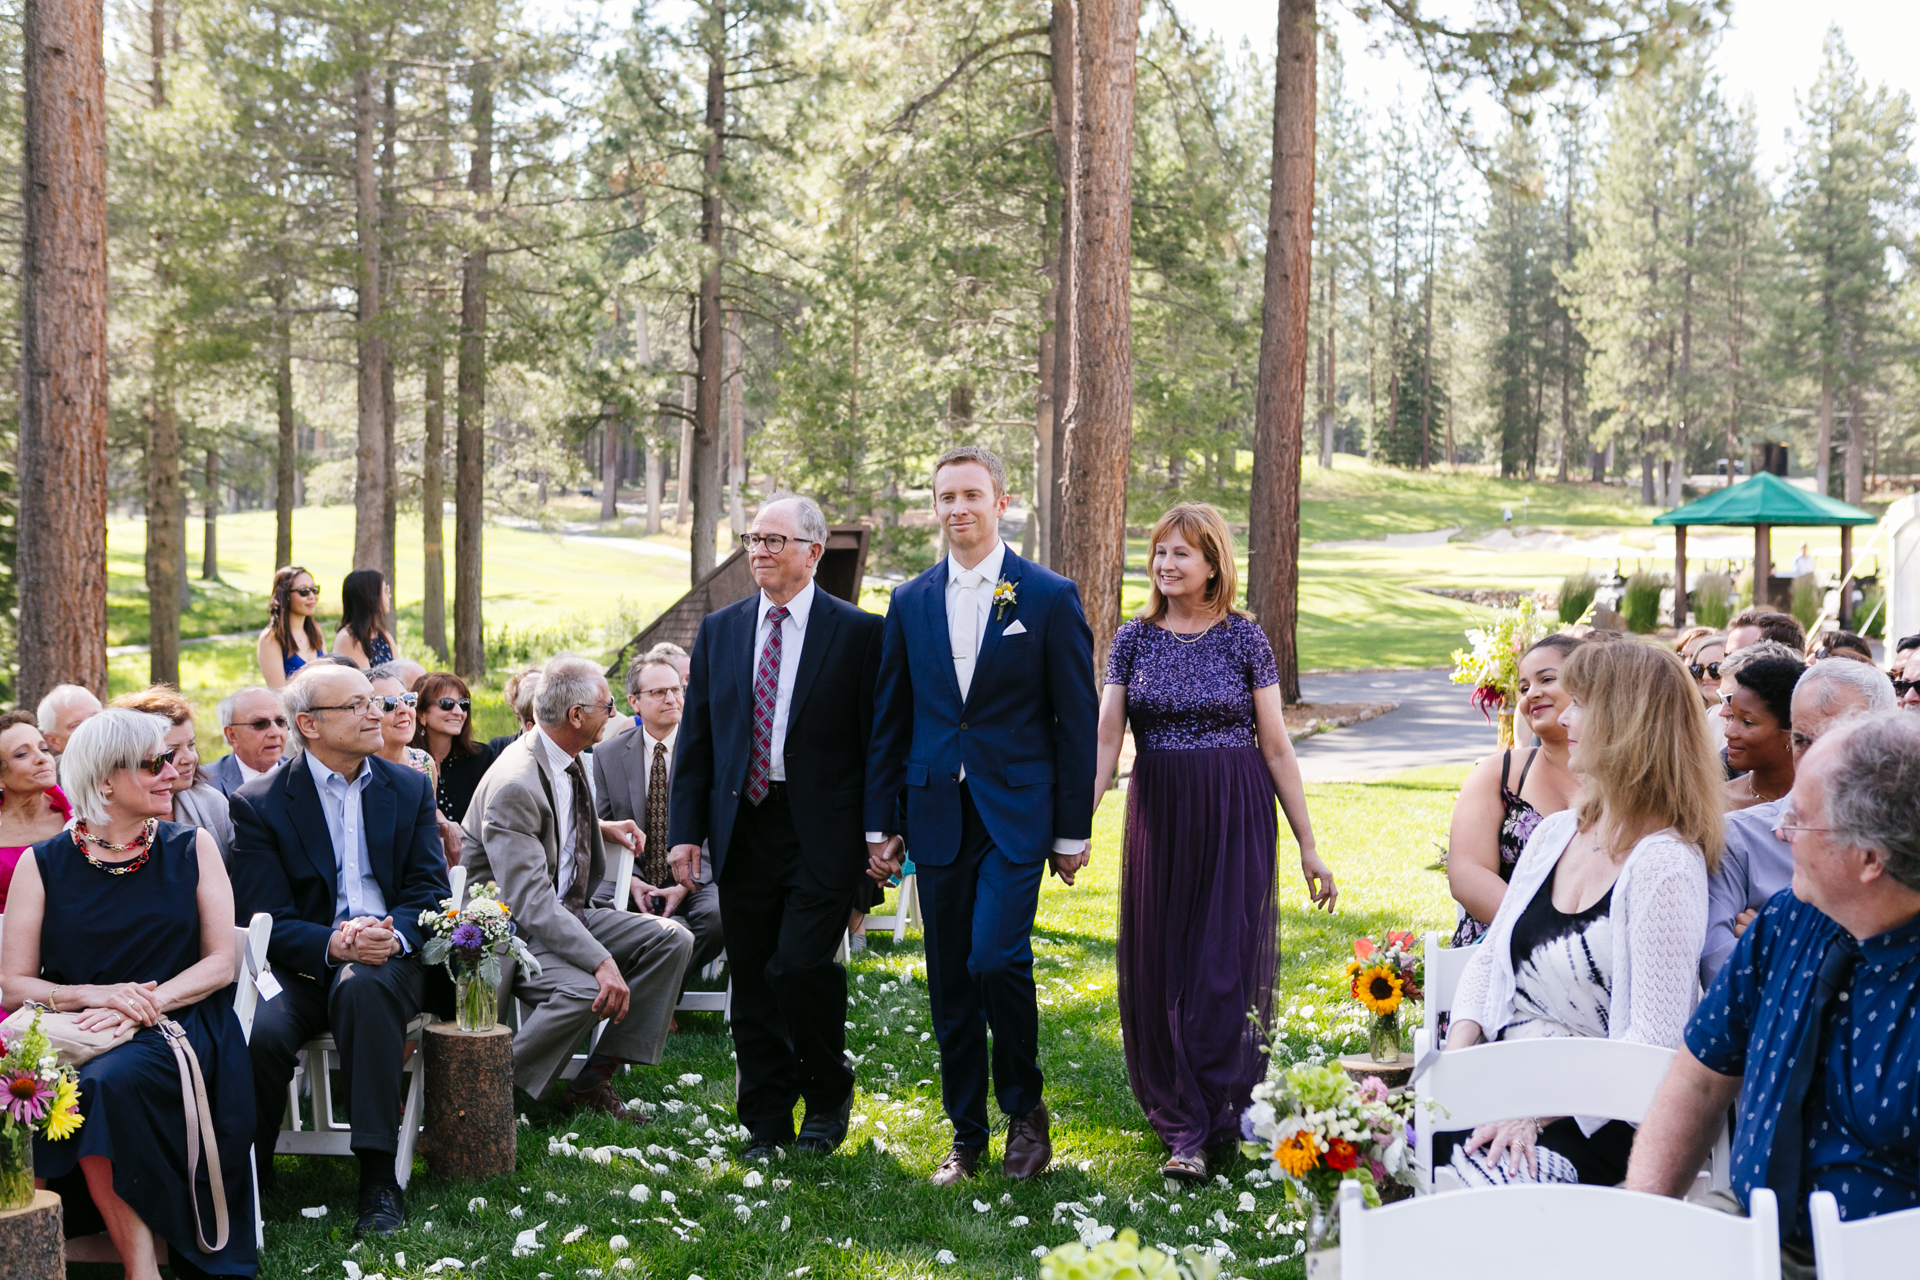 AnneDaniel_WeddingPreview_B3_4153.jpg